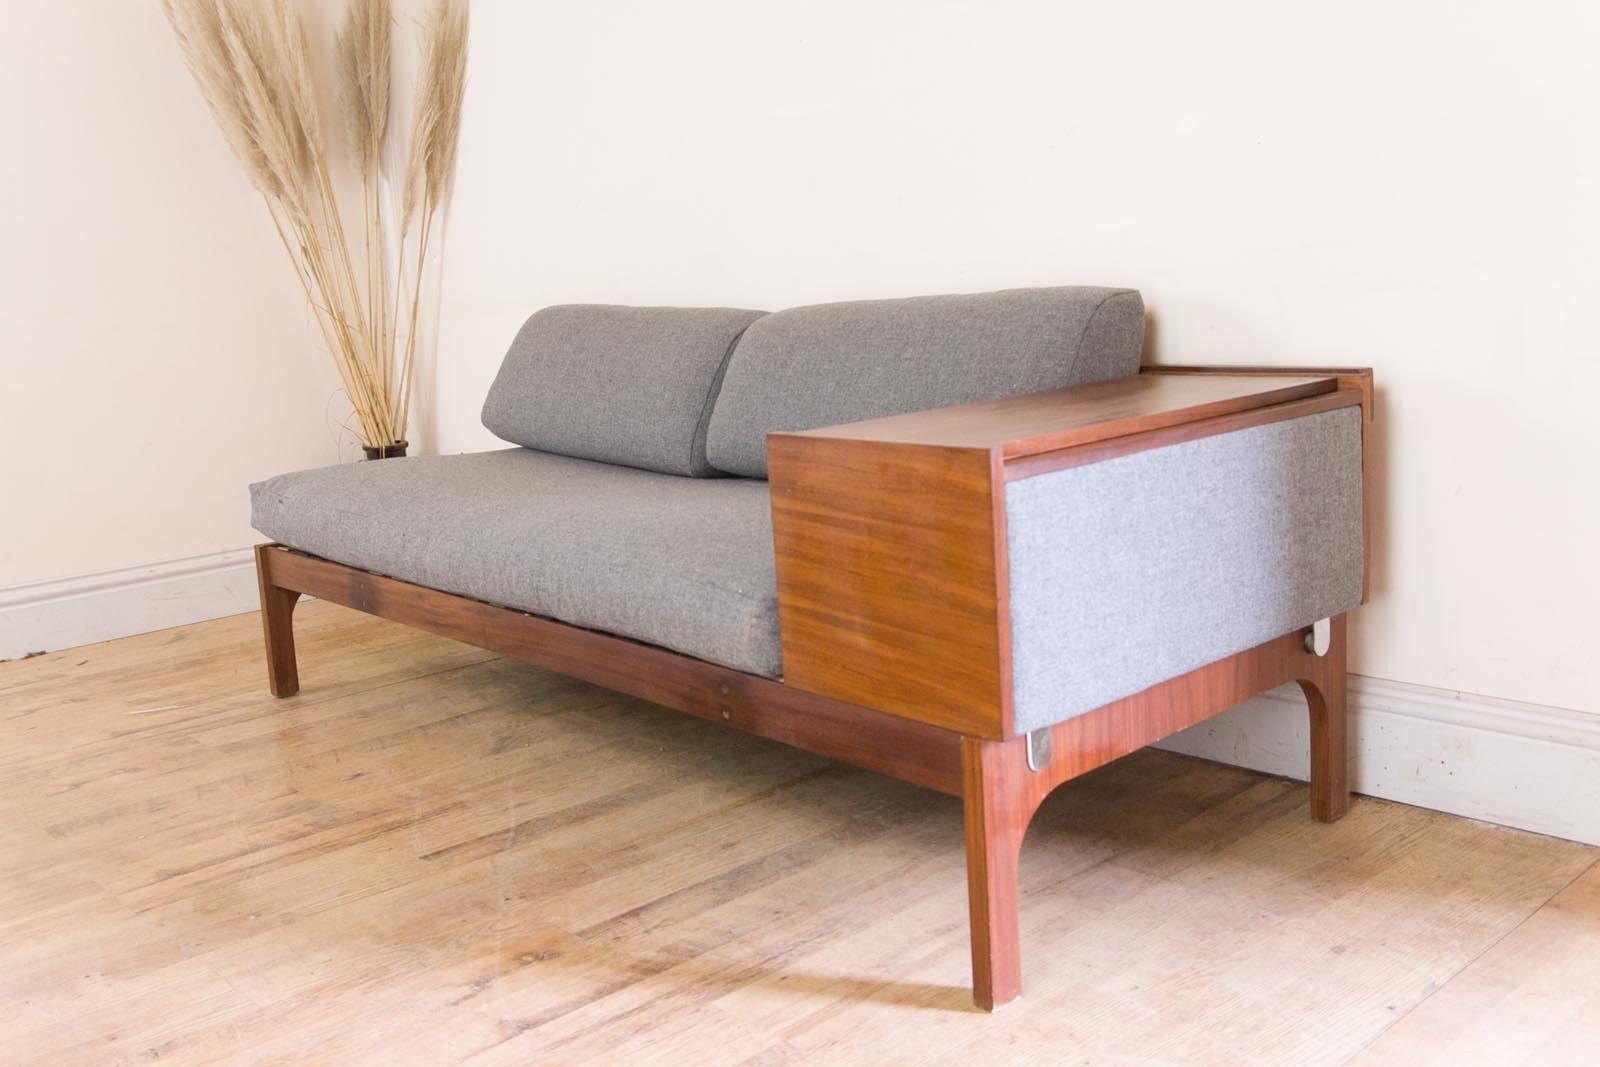 Vintage Retro 1960s Mid Century Teak Daybed Sofa Bed Heals Era Scandinavian Ebay Minimalist Living Room Patio Furniture For Sale Daybed Sofa